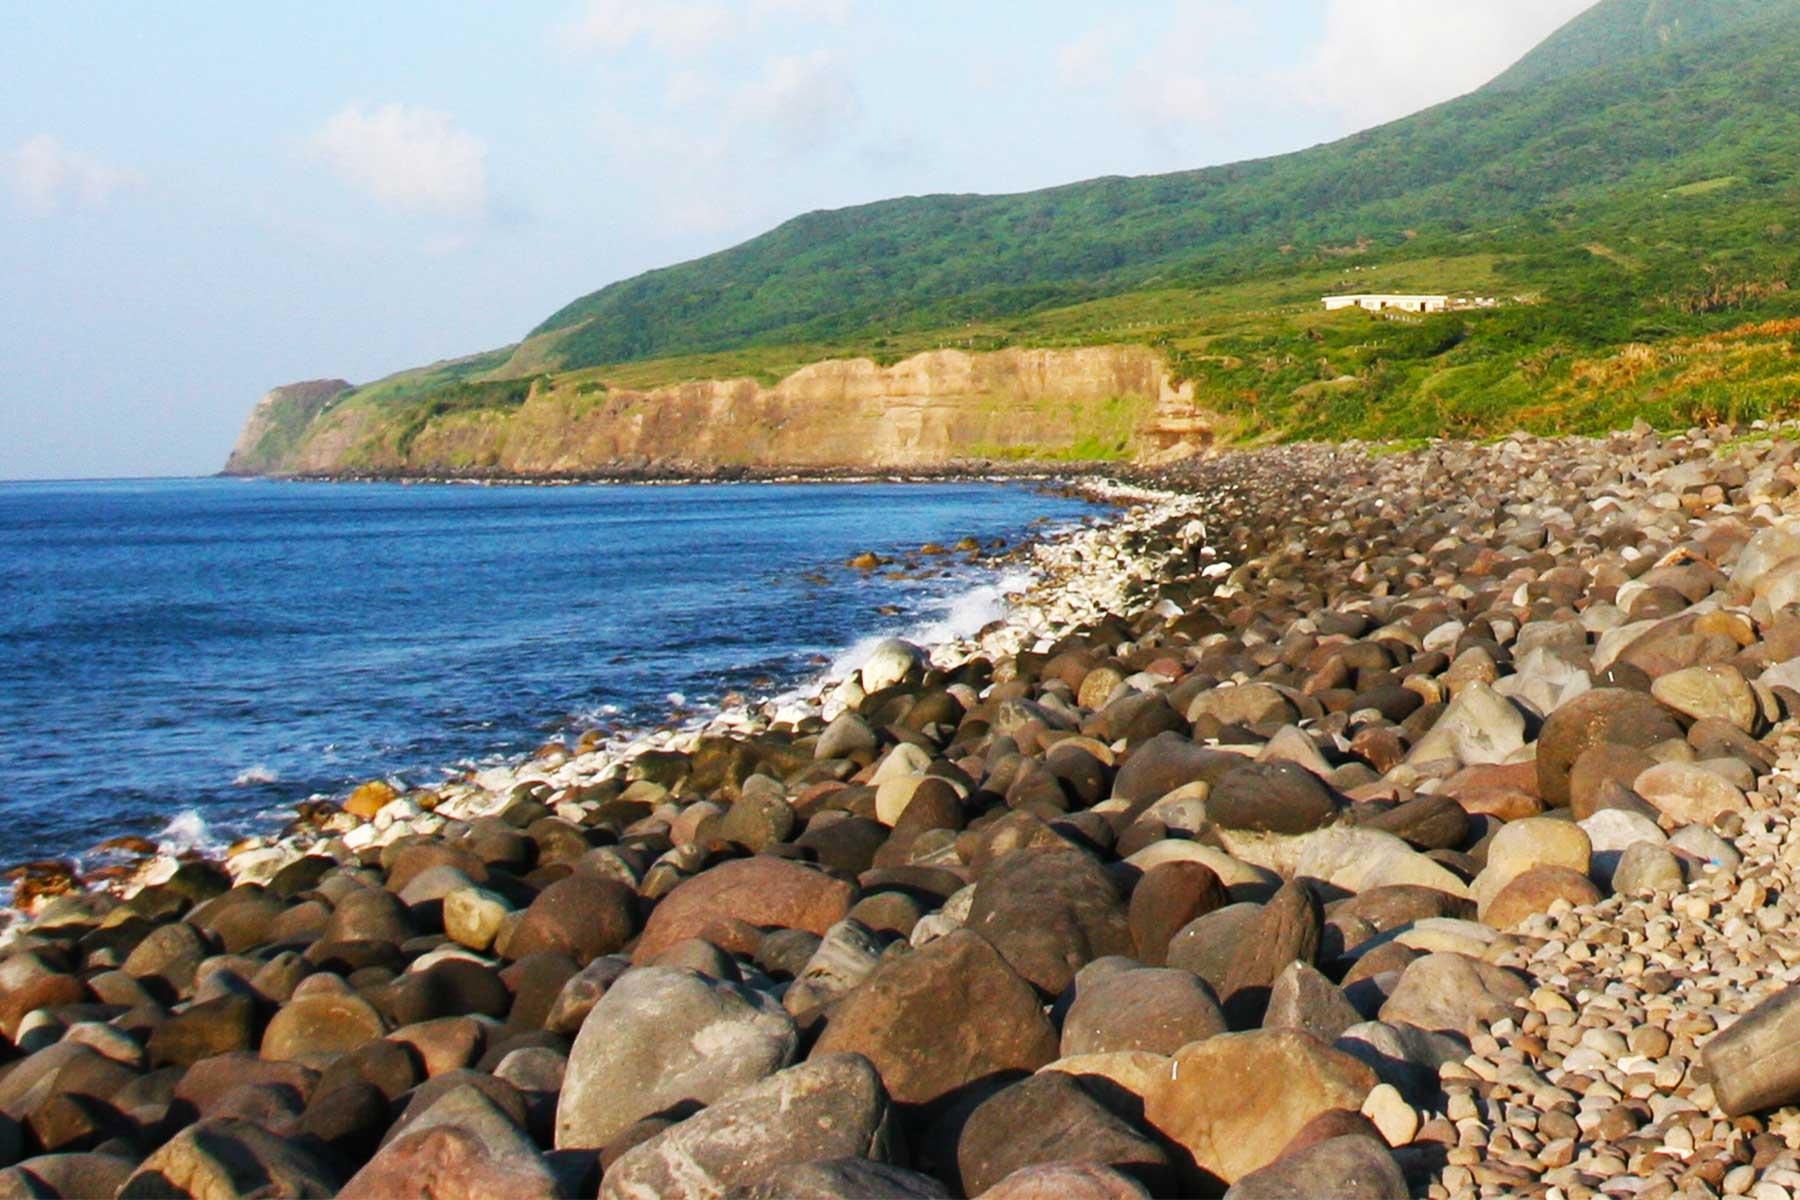 Batanes Islands Geography - Limestone cliffs - Volcanic boulder beaches - Dr Steven Andrew Martin - Photo journal